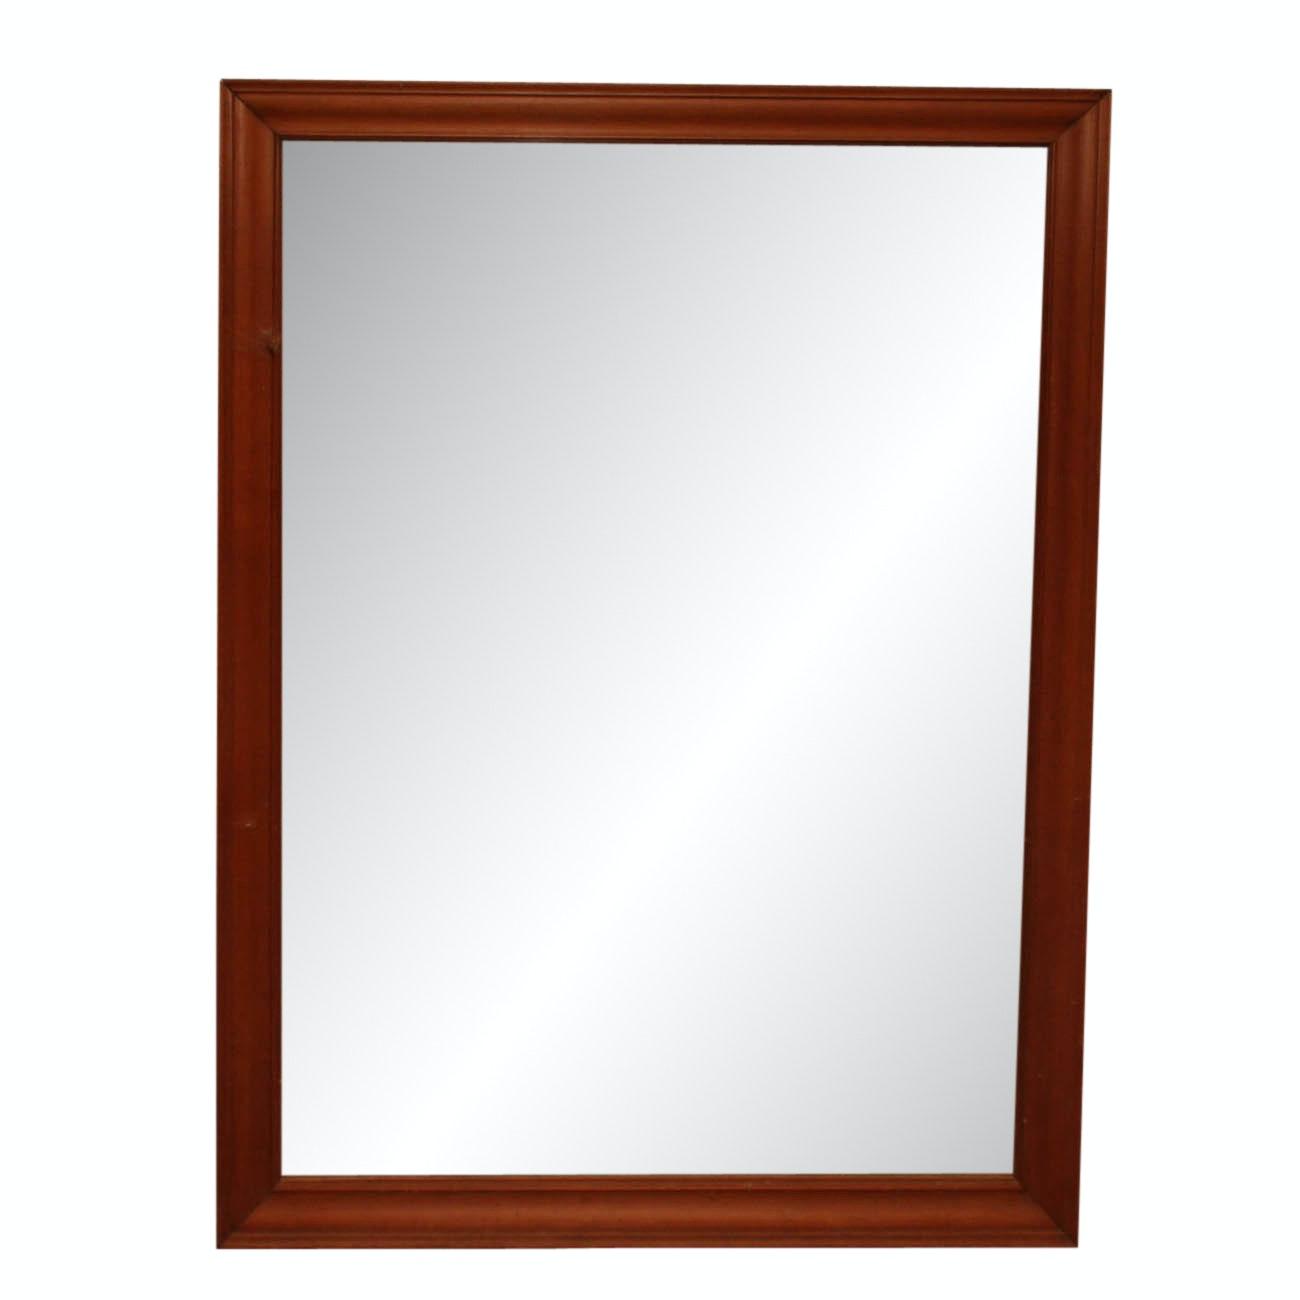 Framed Wooden Glass Mirror